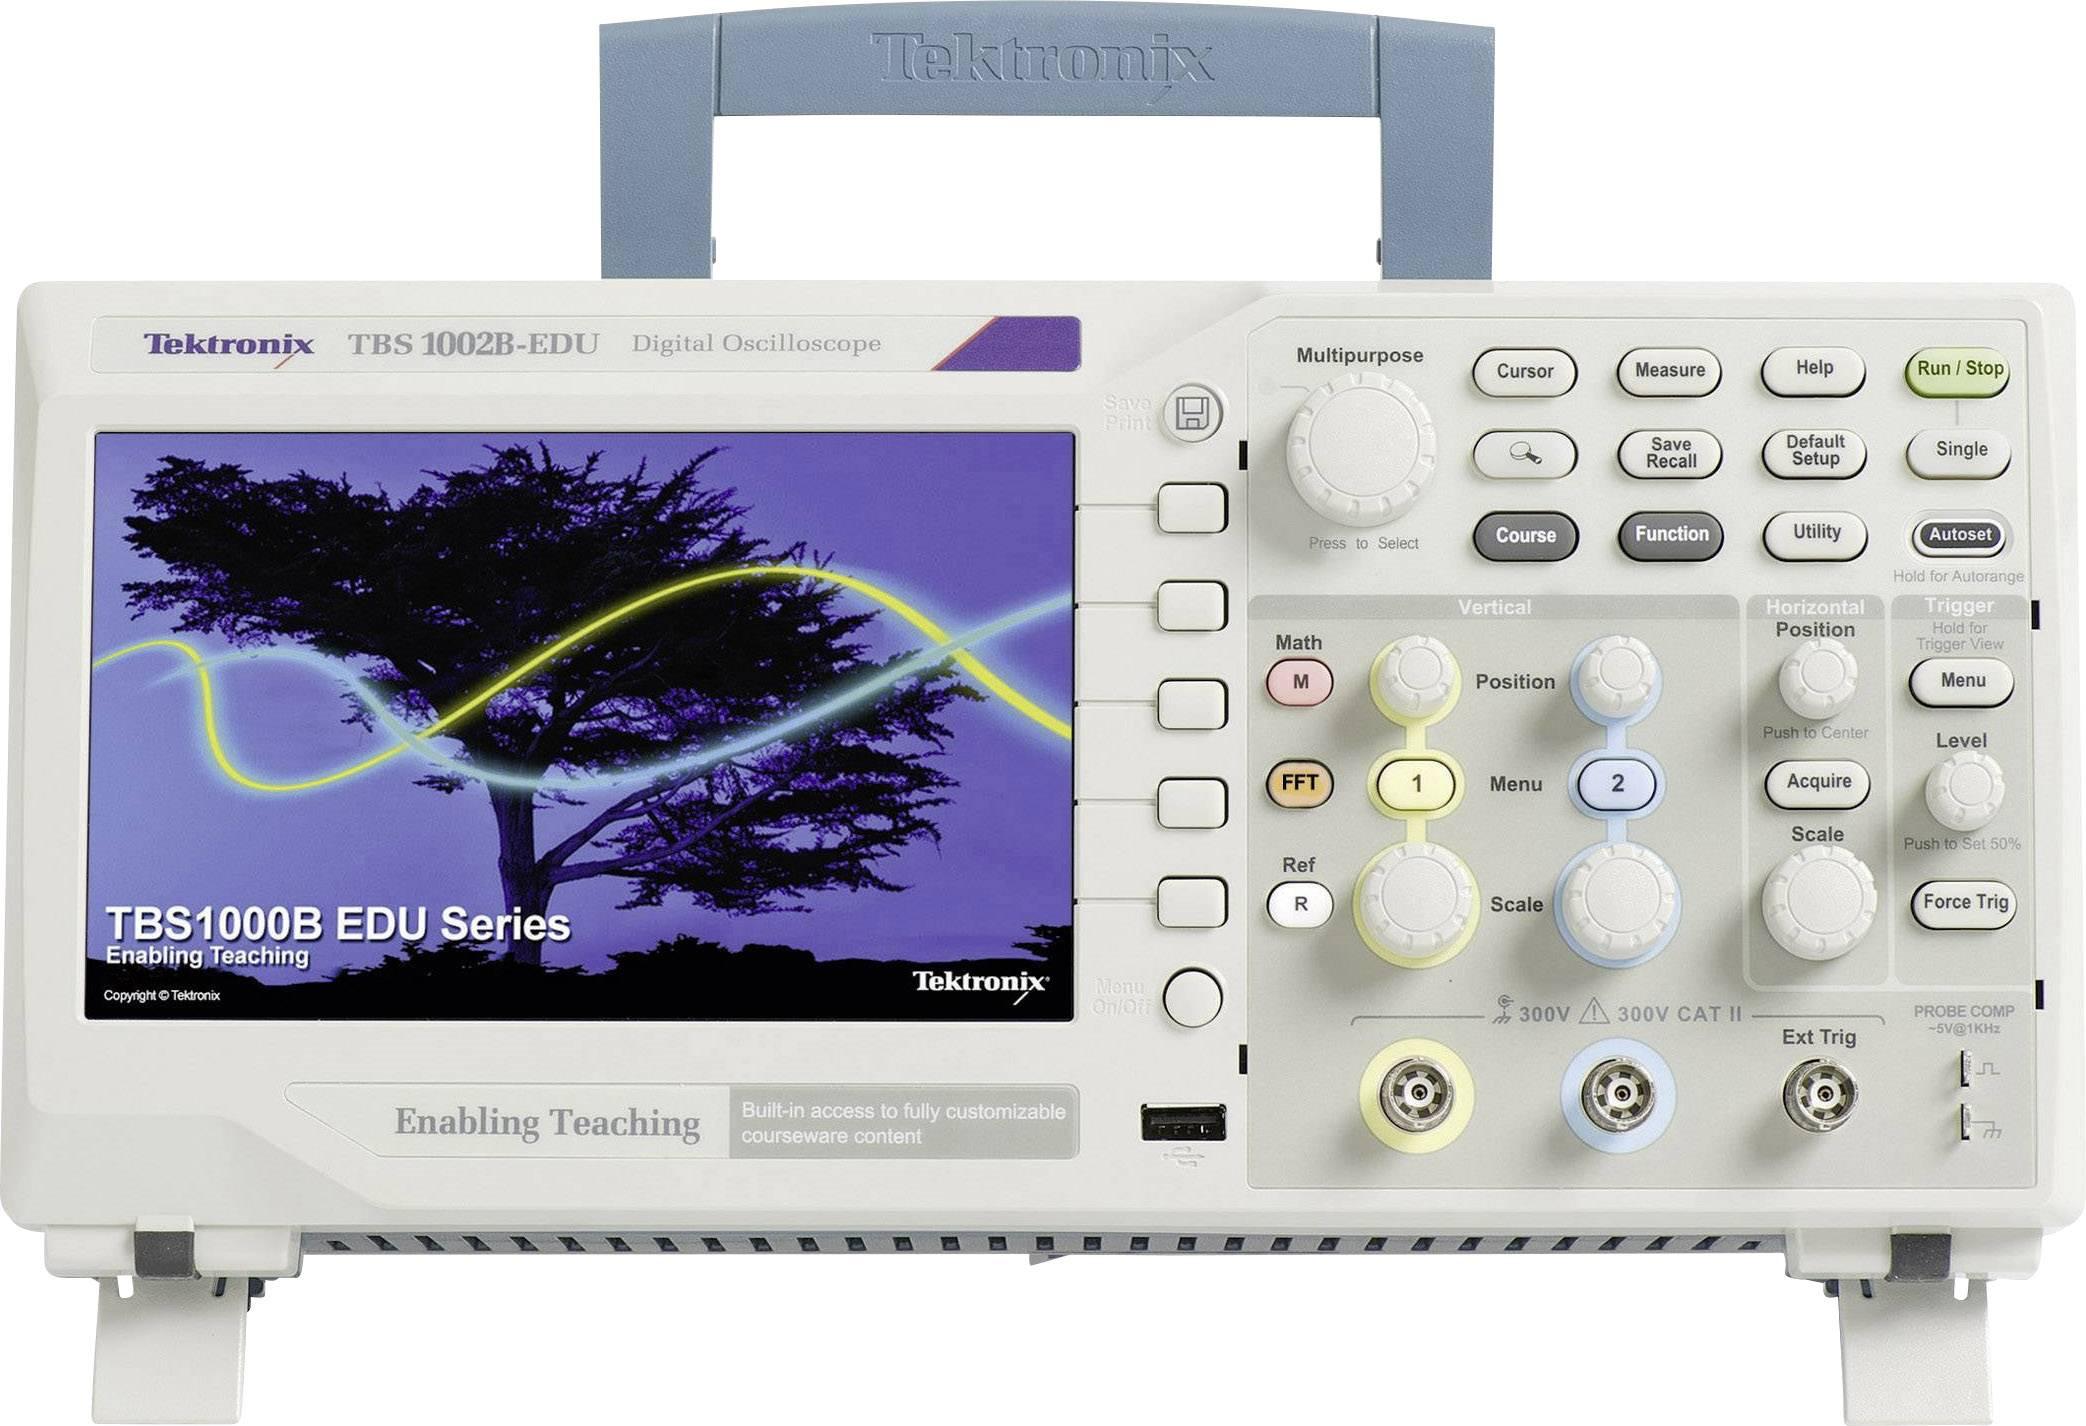 Digitálny osciloskop Tektronix TBS1072B-EDU, 70 MHz, 2-kanálový, kalibrácia podľa ISO